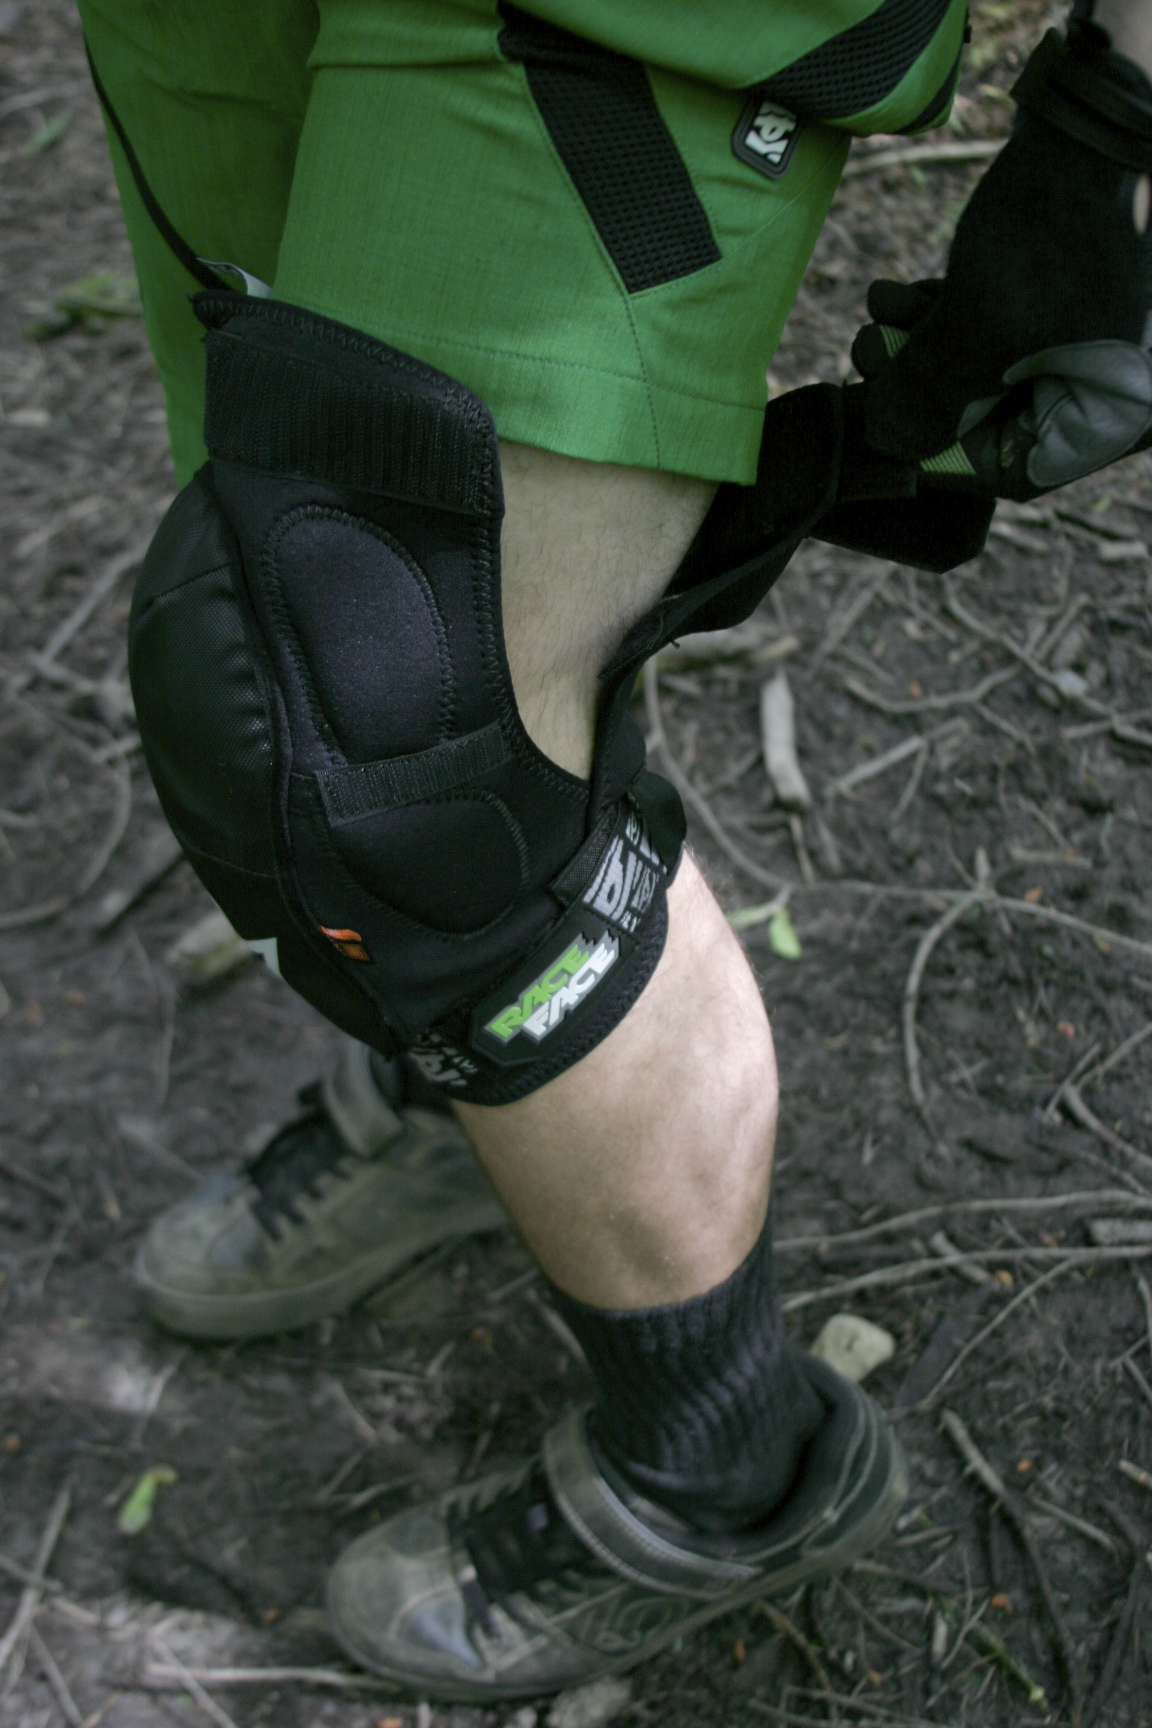 RaceFace Ambush Knee Guard Black MD